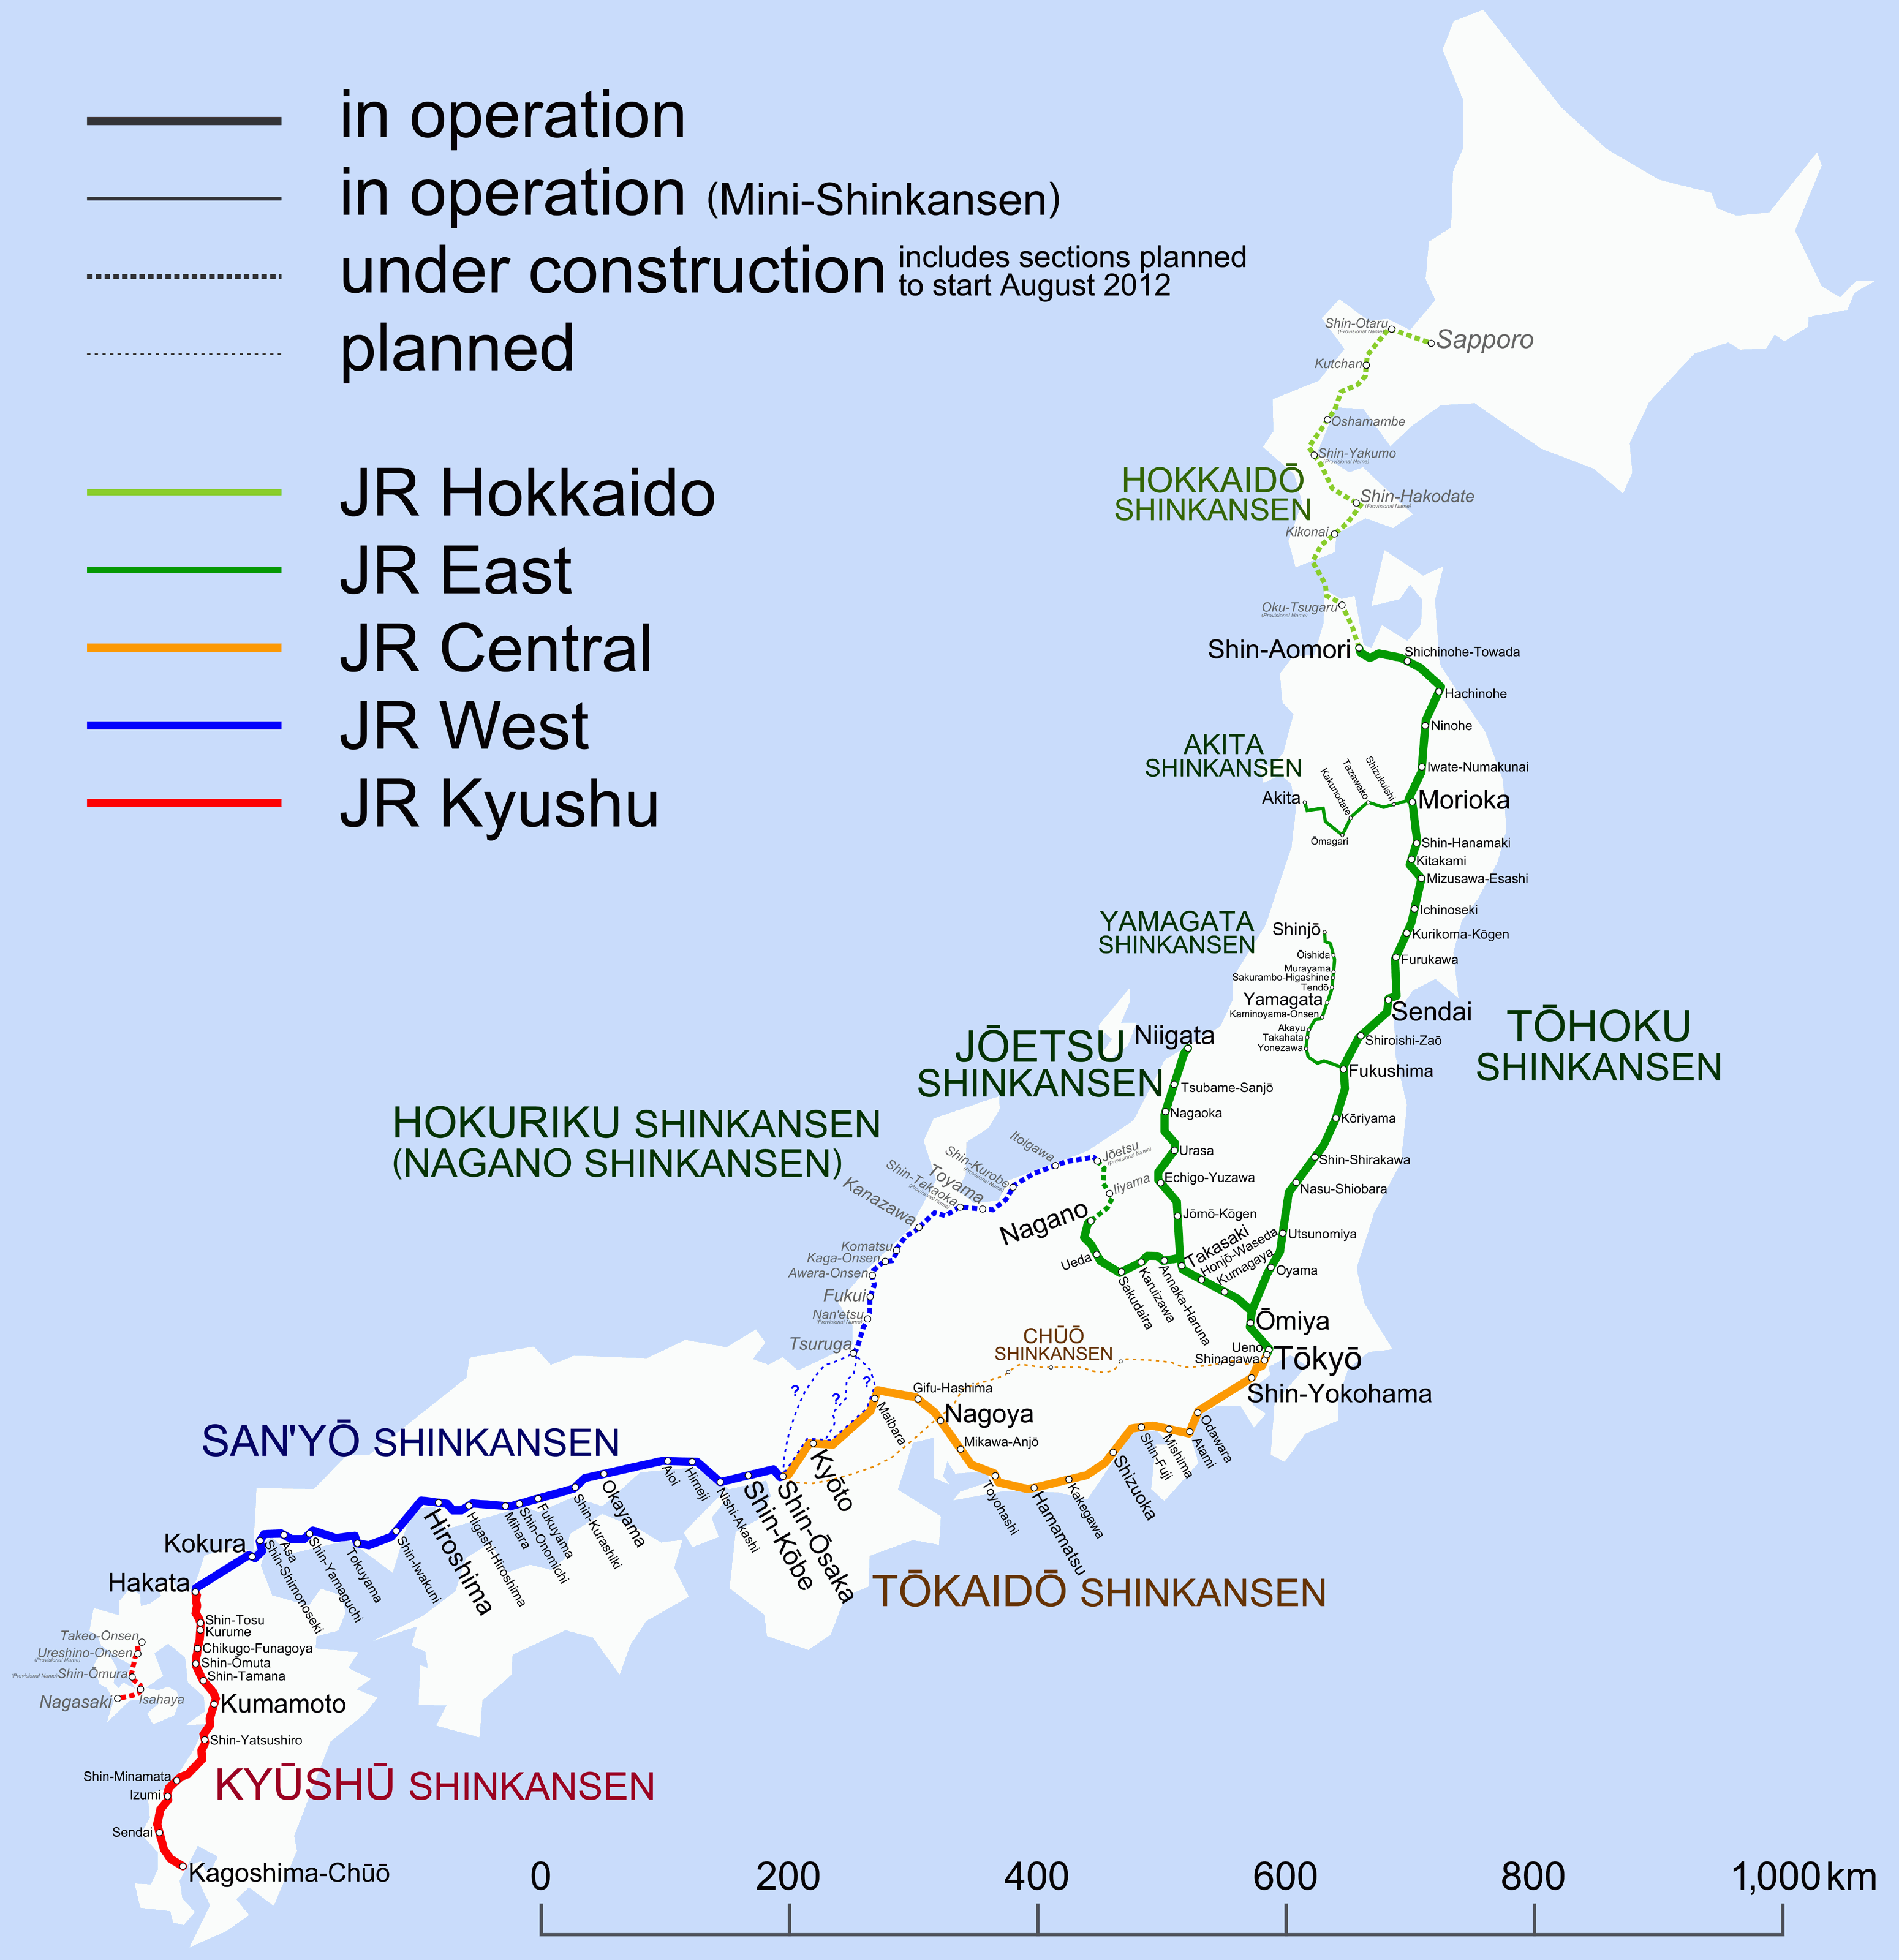 Mapa Shinkansen tren bala japon